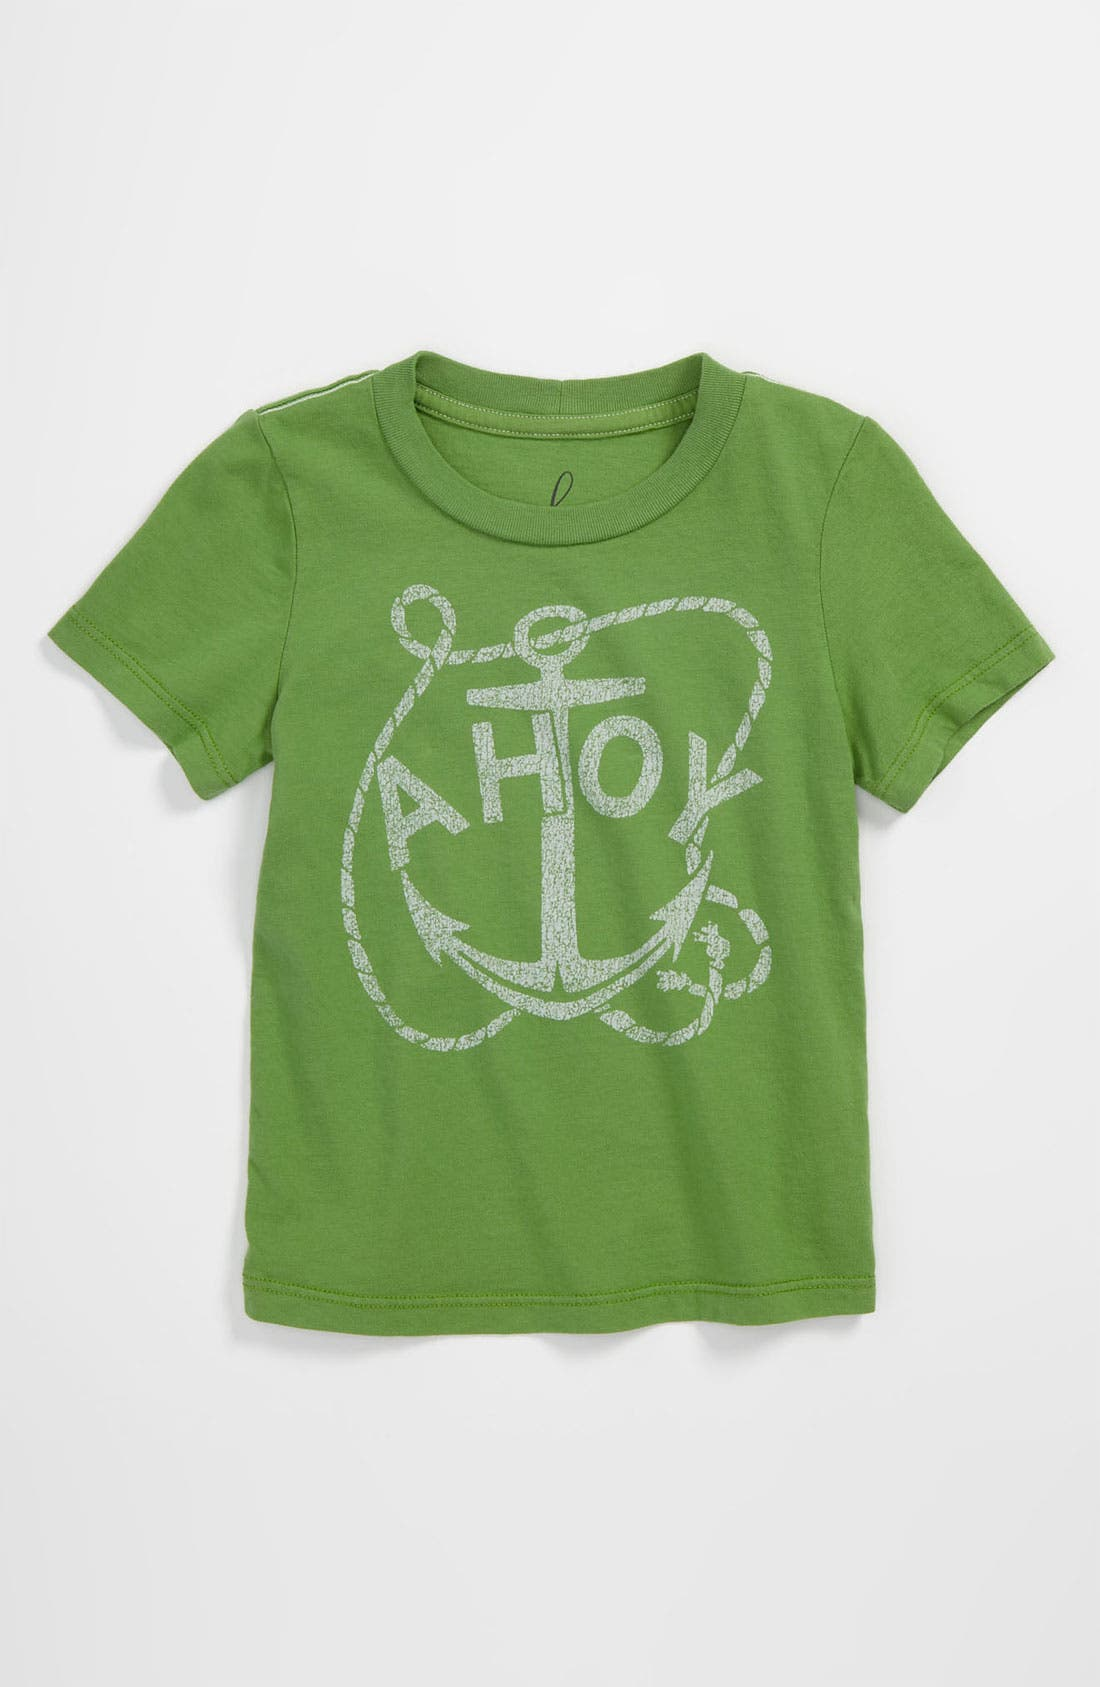 Main Image - Peek 'Ahoy' T-Shirt (Baby)